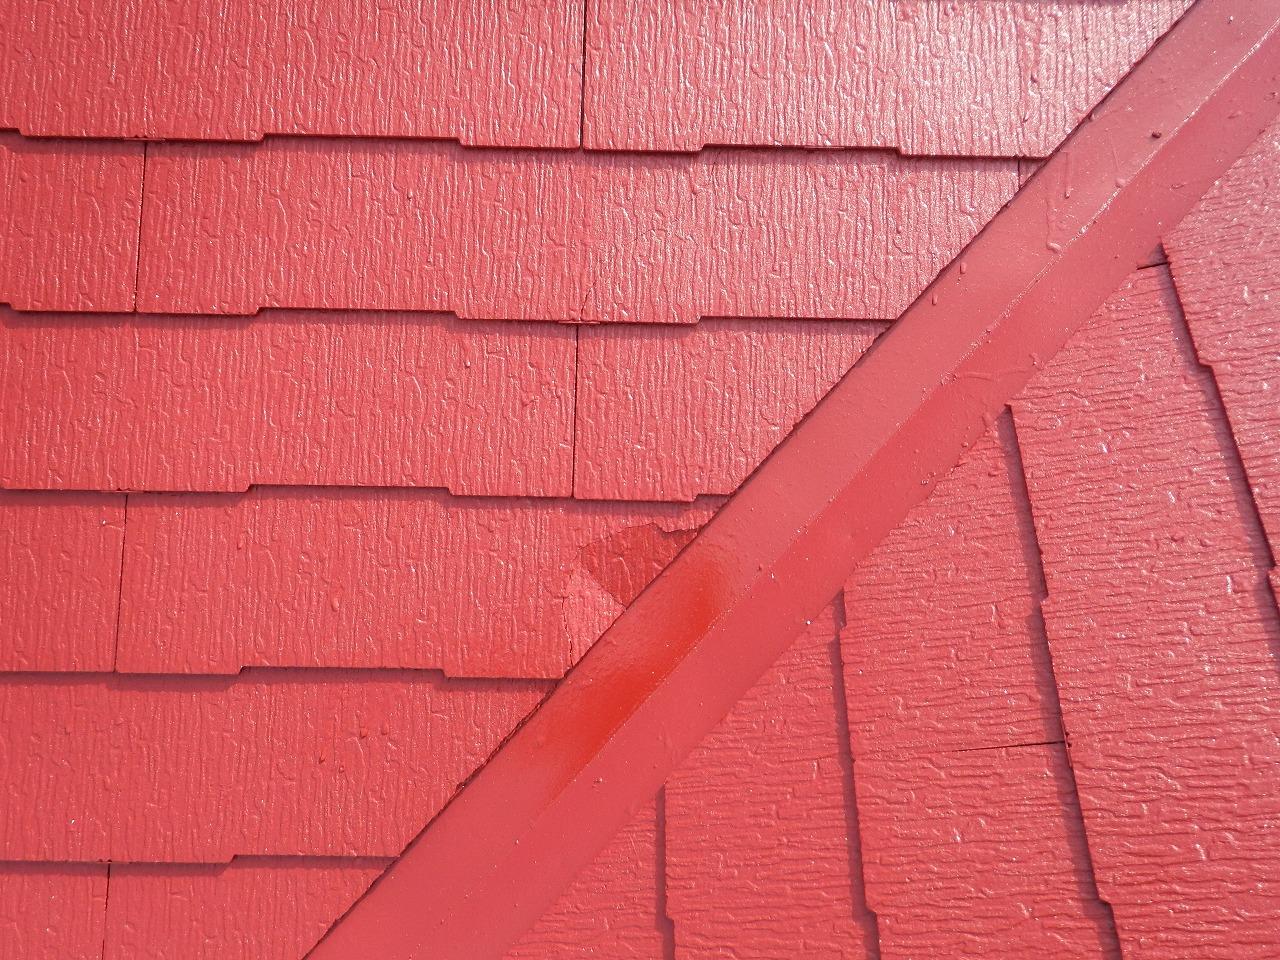 生駒市のスレート屋根塗装、破損屋根材発見